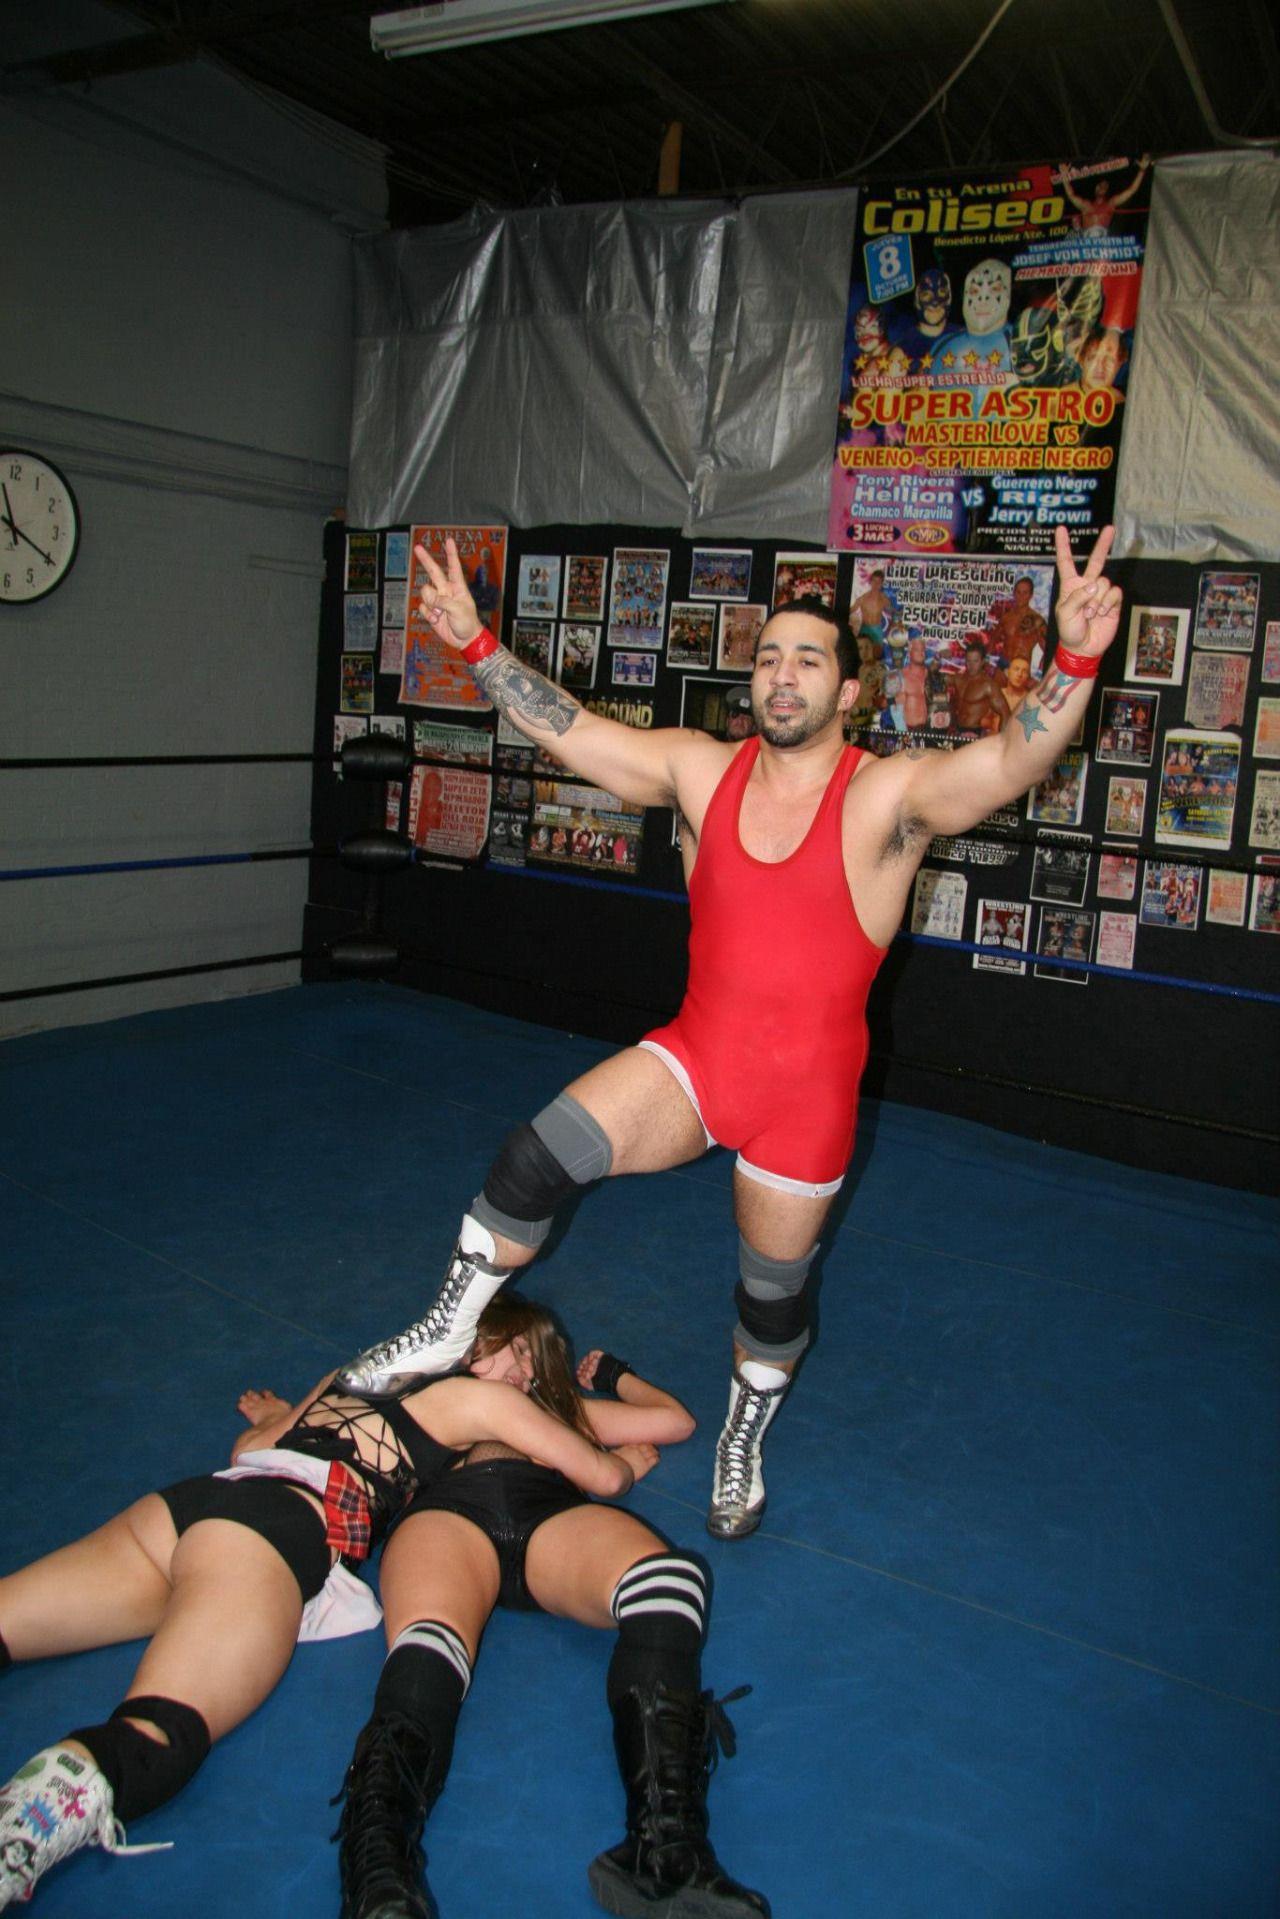 2 on 1 mixed wrestling | mixed wrestling | pinterest